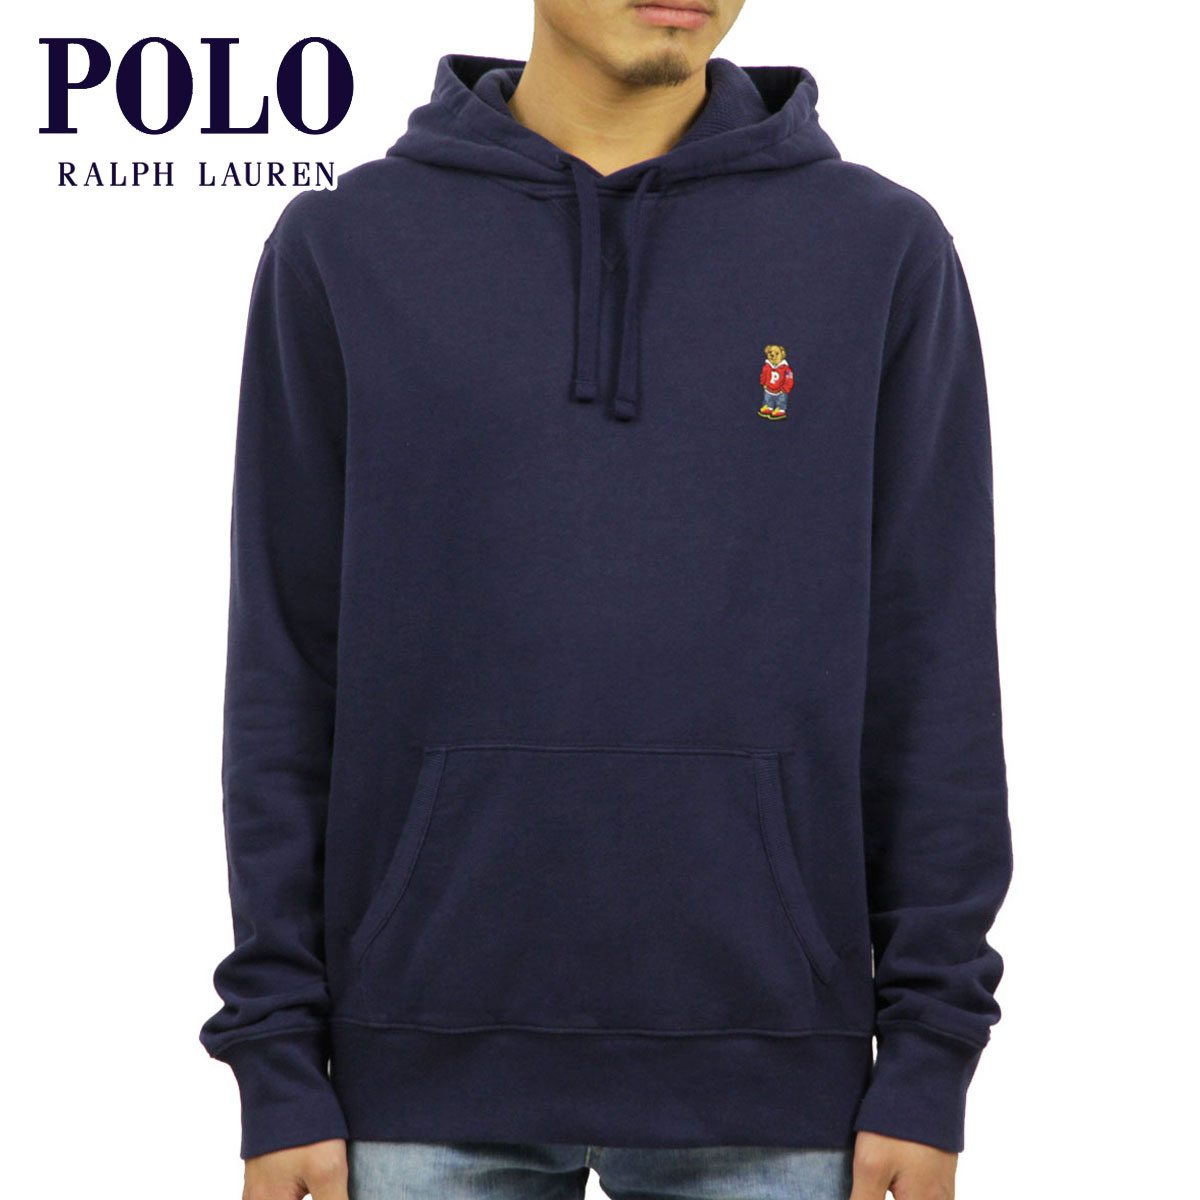 sale retailer e96b4 79f88 Polo Ralph Lauren parka men's regular article POLO RALPH LAUREN pullover  parka POLO BEAR FLEECE HOODIE